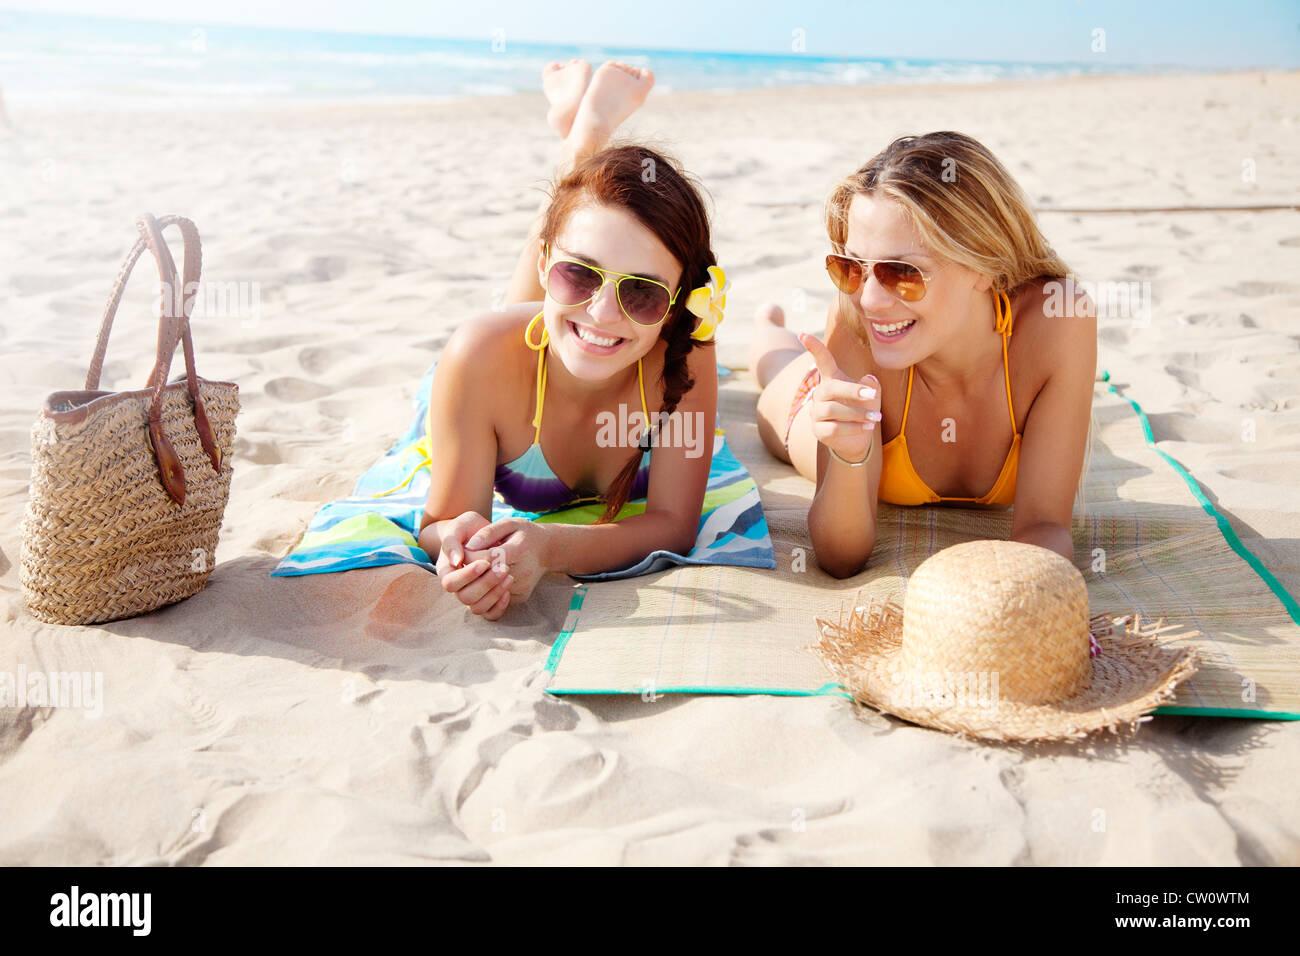 beach holiday - Stock Image